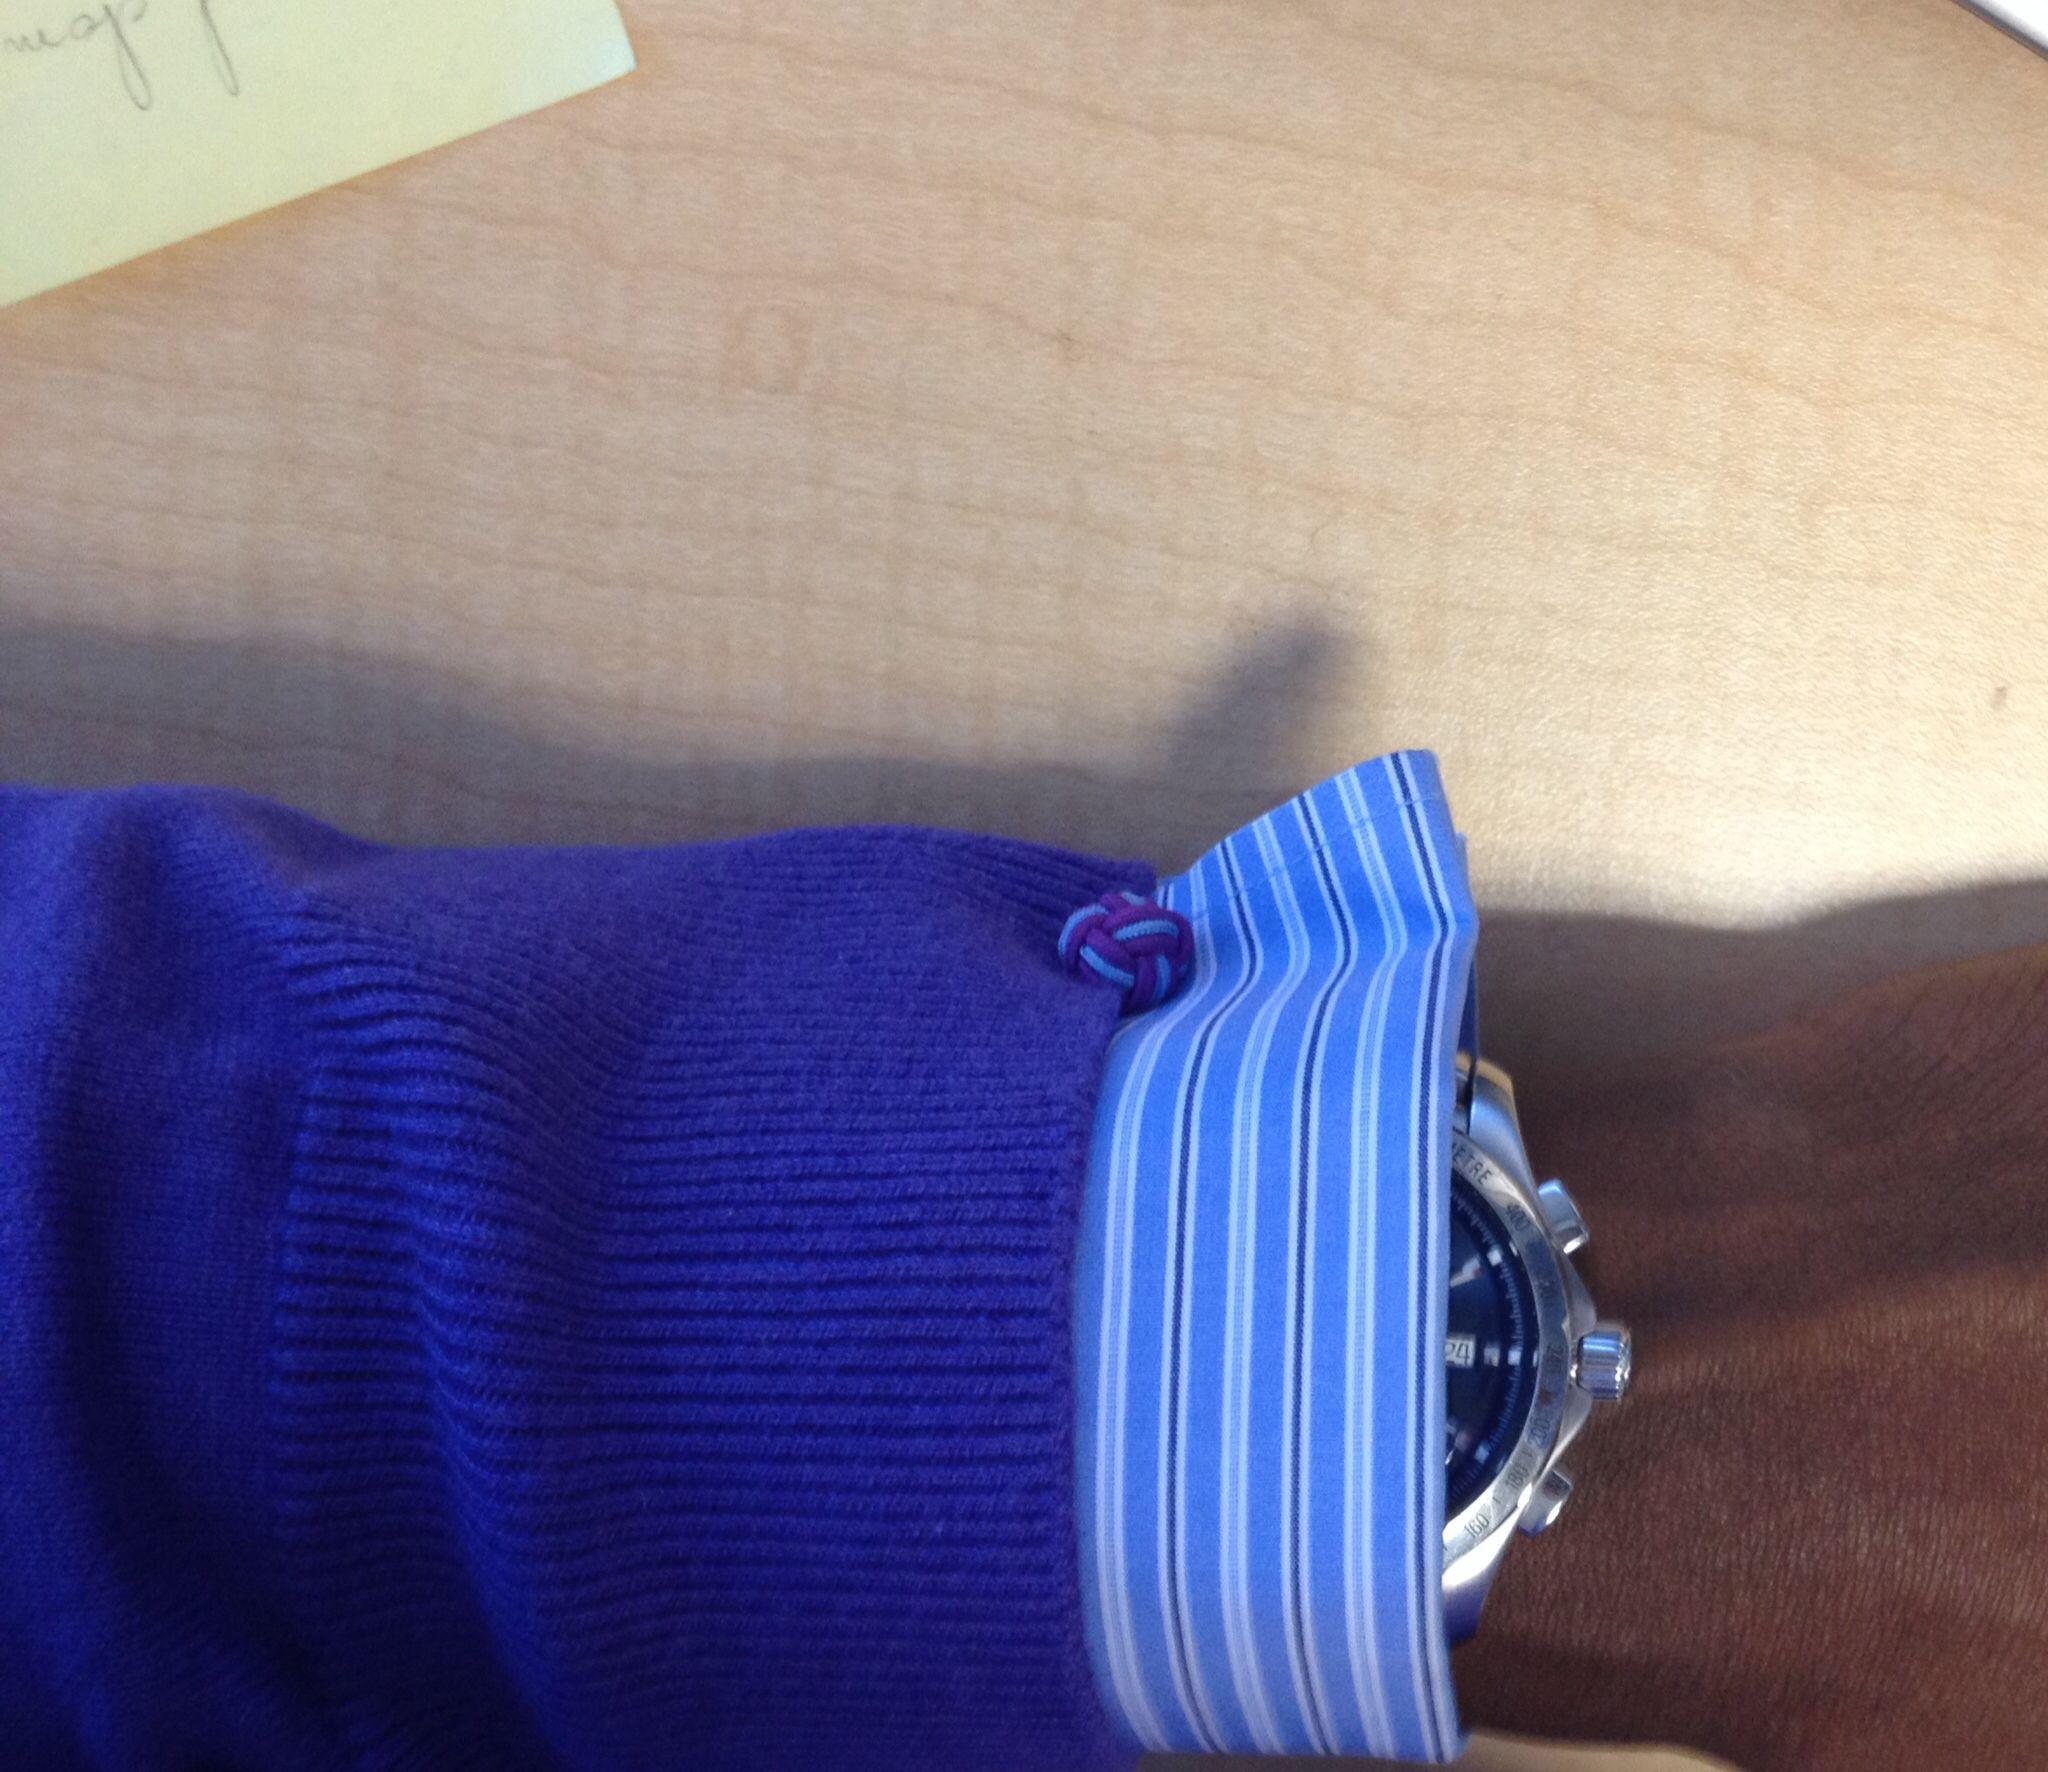 Purple jumper